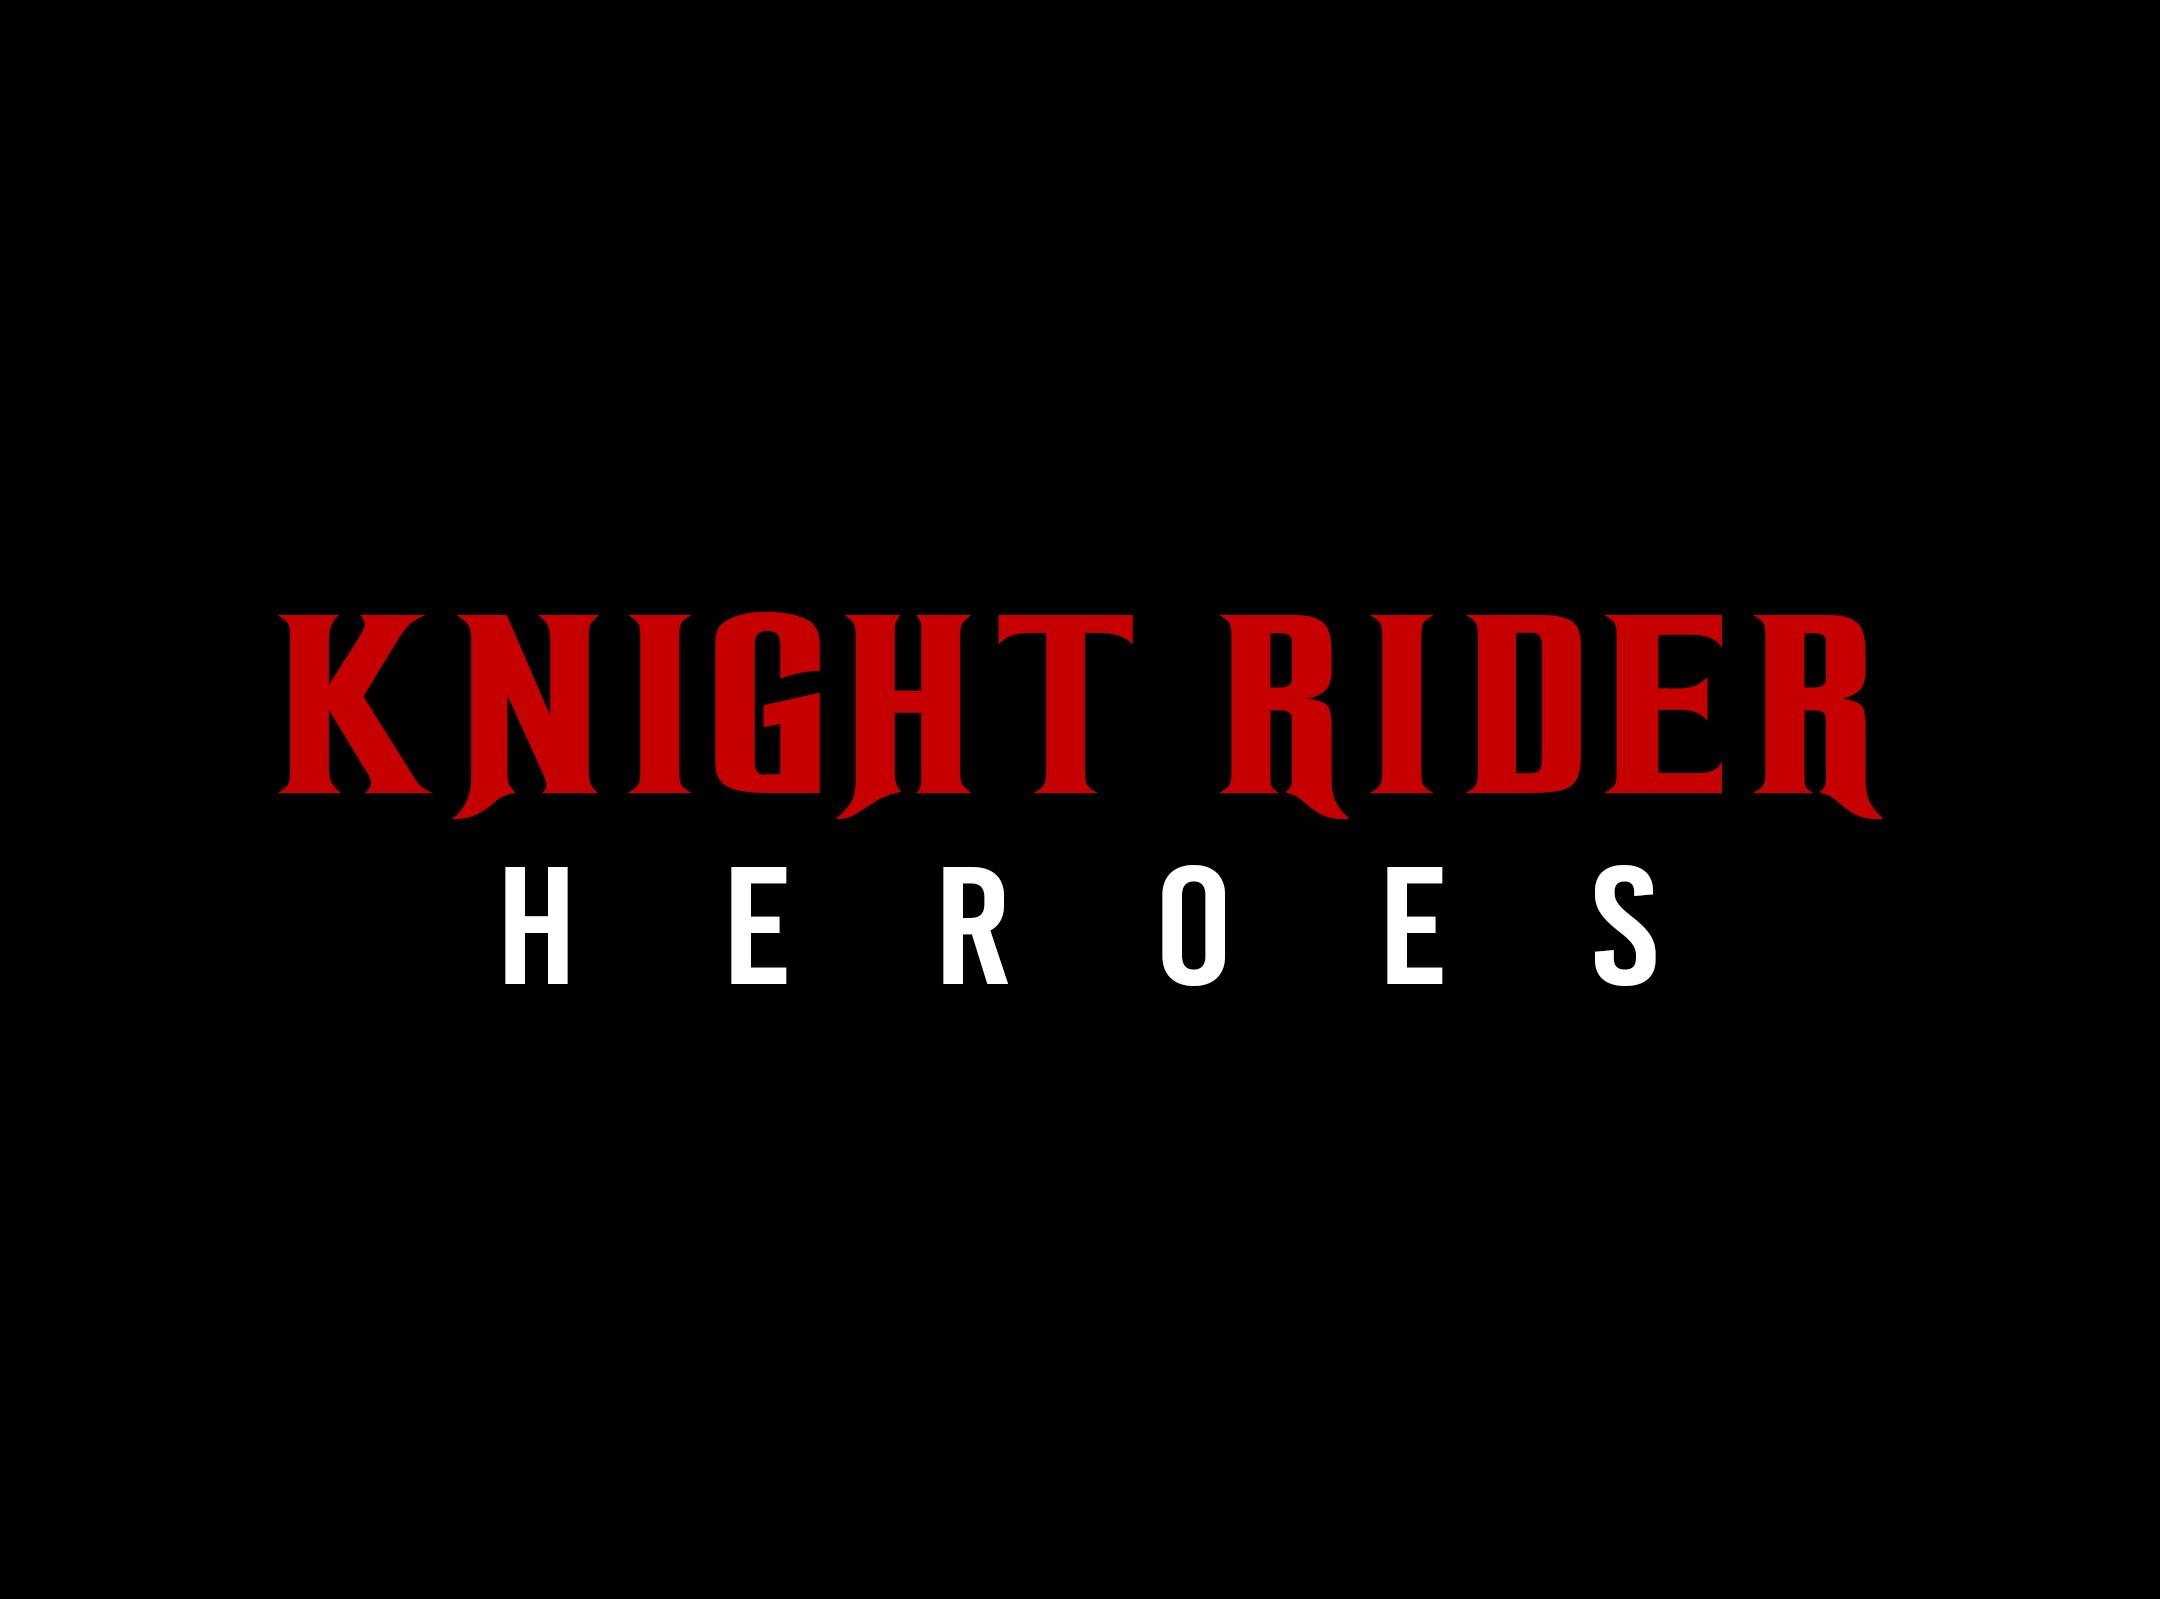 Knight Rider Heroes